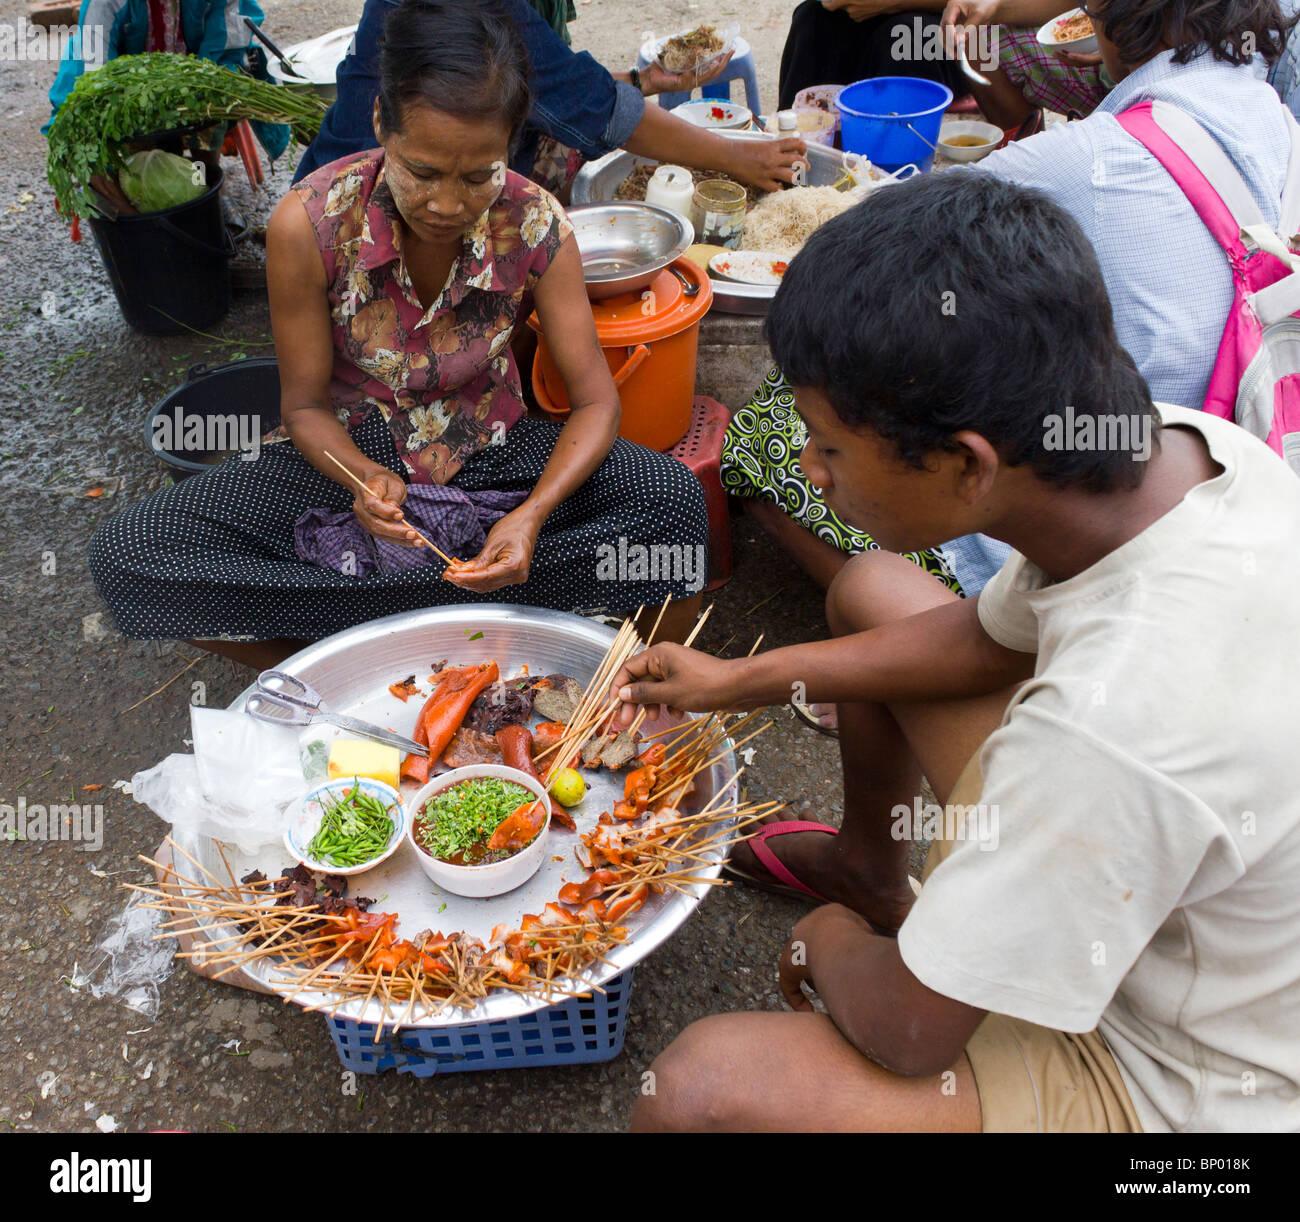 manual labourer eating lunch at stand, Yangon docks, Myanmar - Stock Image